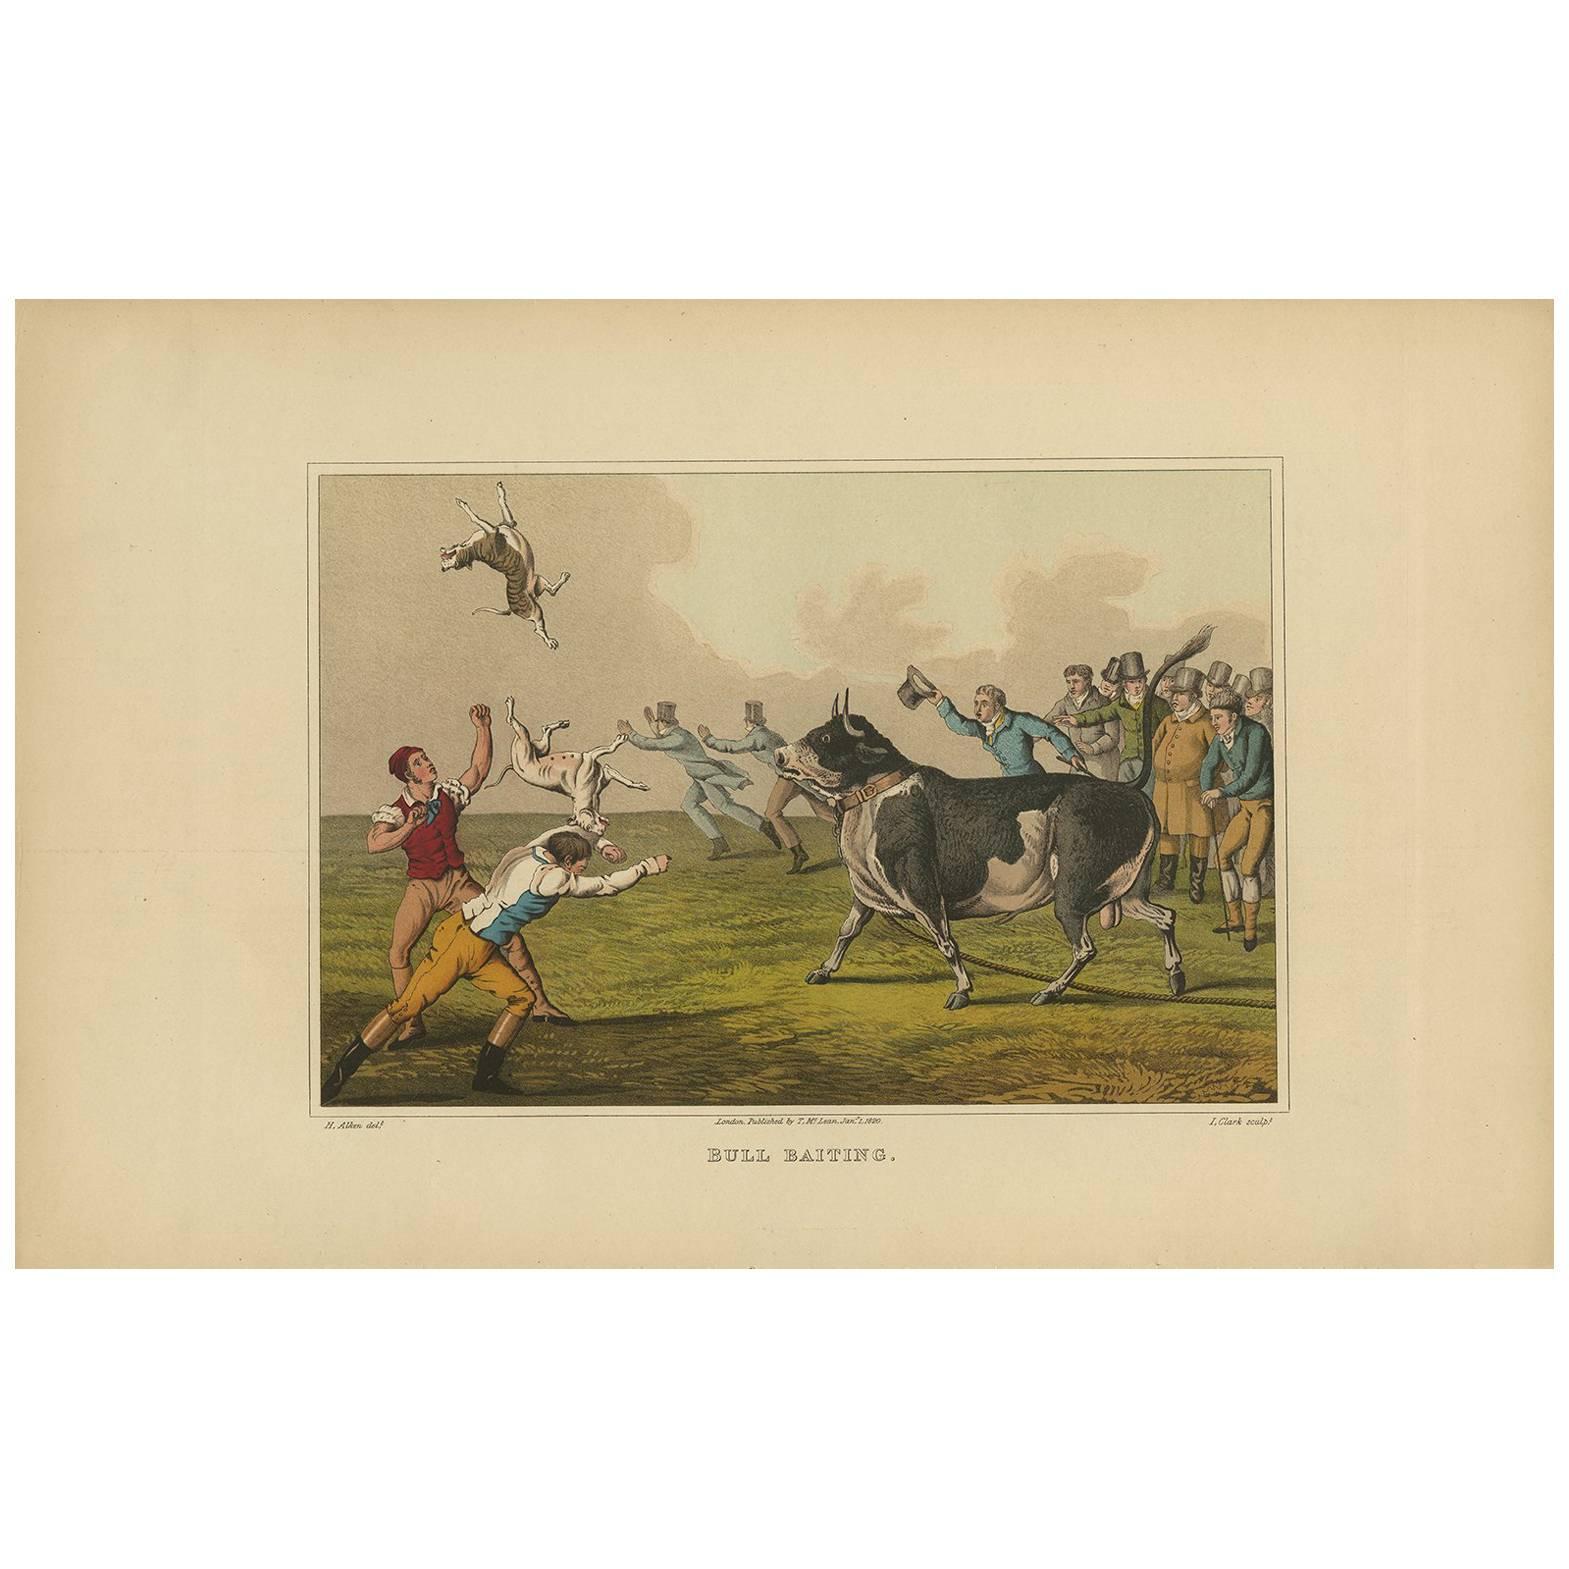 Antique Aquatint 'Bull Baiting' by J. Clark, 1820